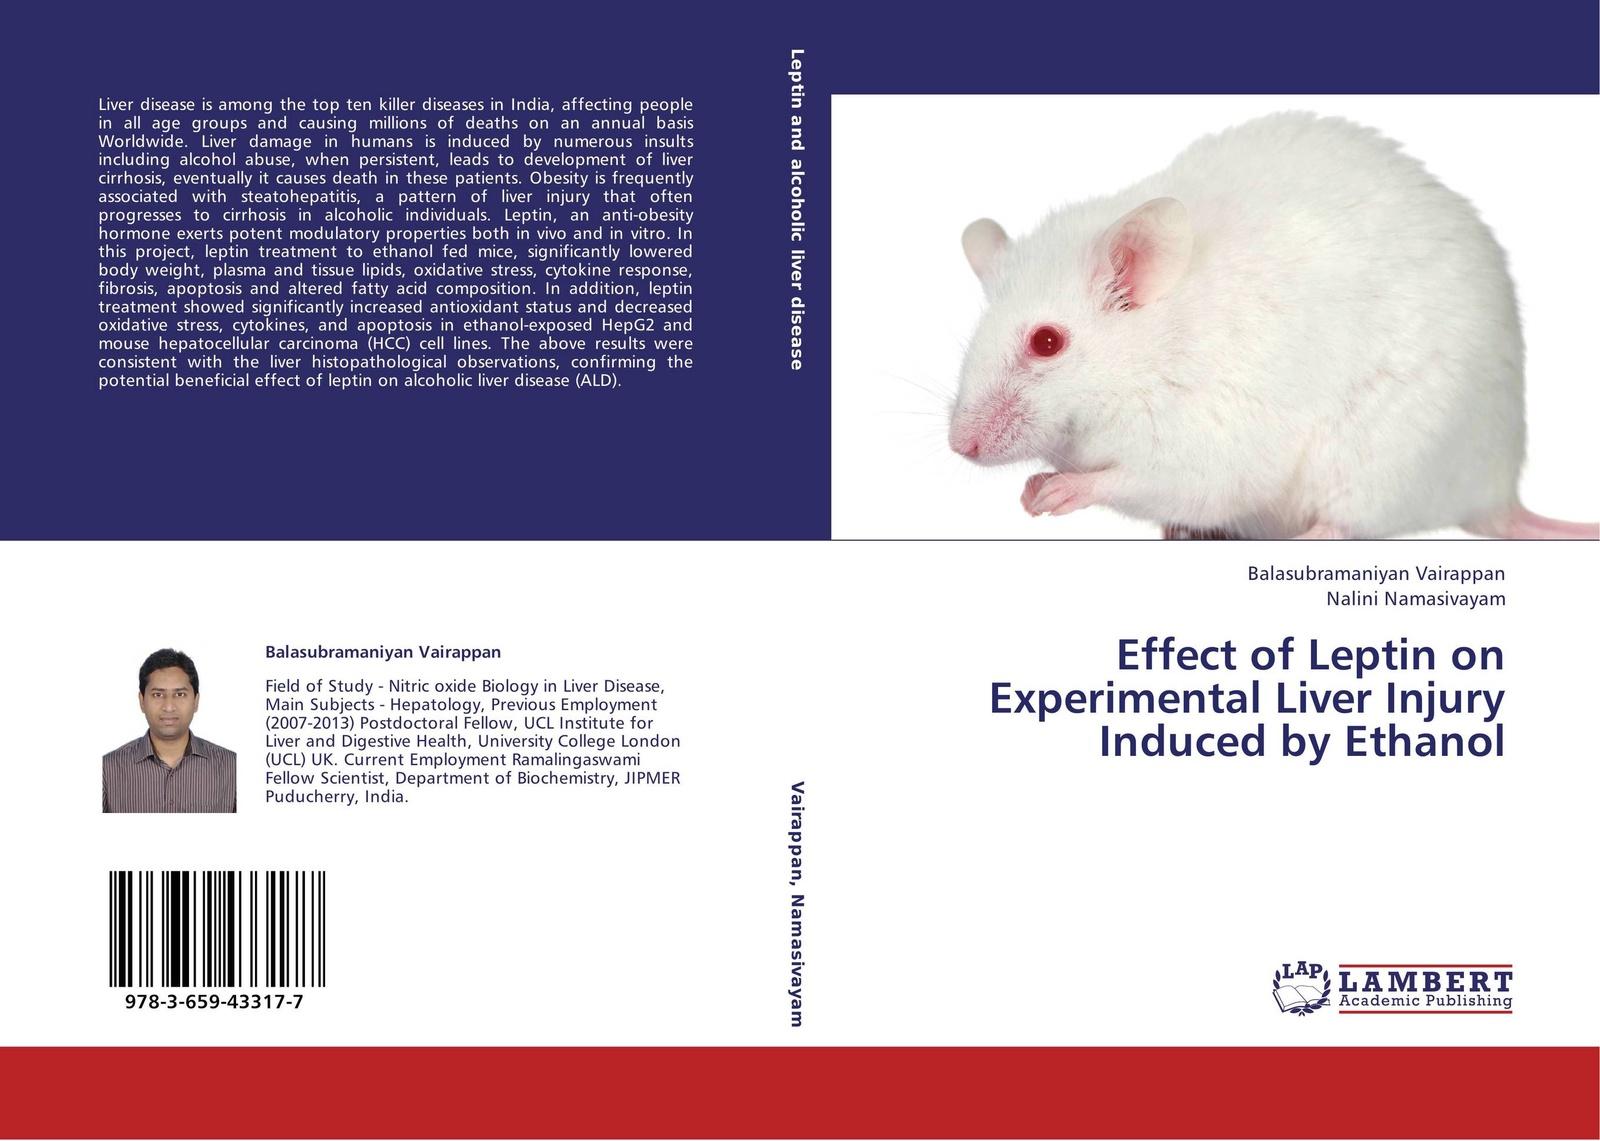 Balasubramaniyan Vairappan and Nalini Namasivayam Effect of Leptin on Experimental Liver Injury Induced by Ethanol enovo hepatitis b fatty liver cirrhosis liver model digestive medicine hepatobiliary health model